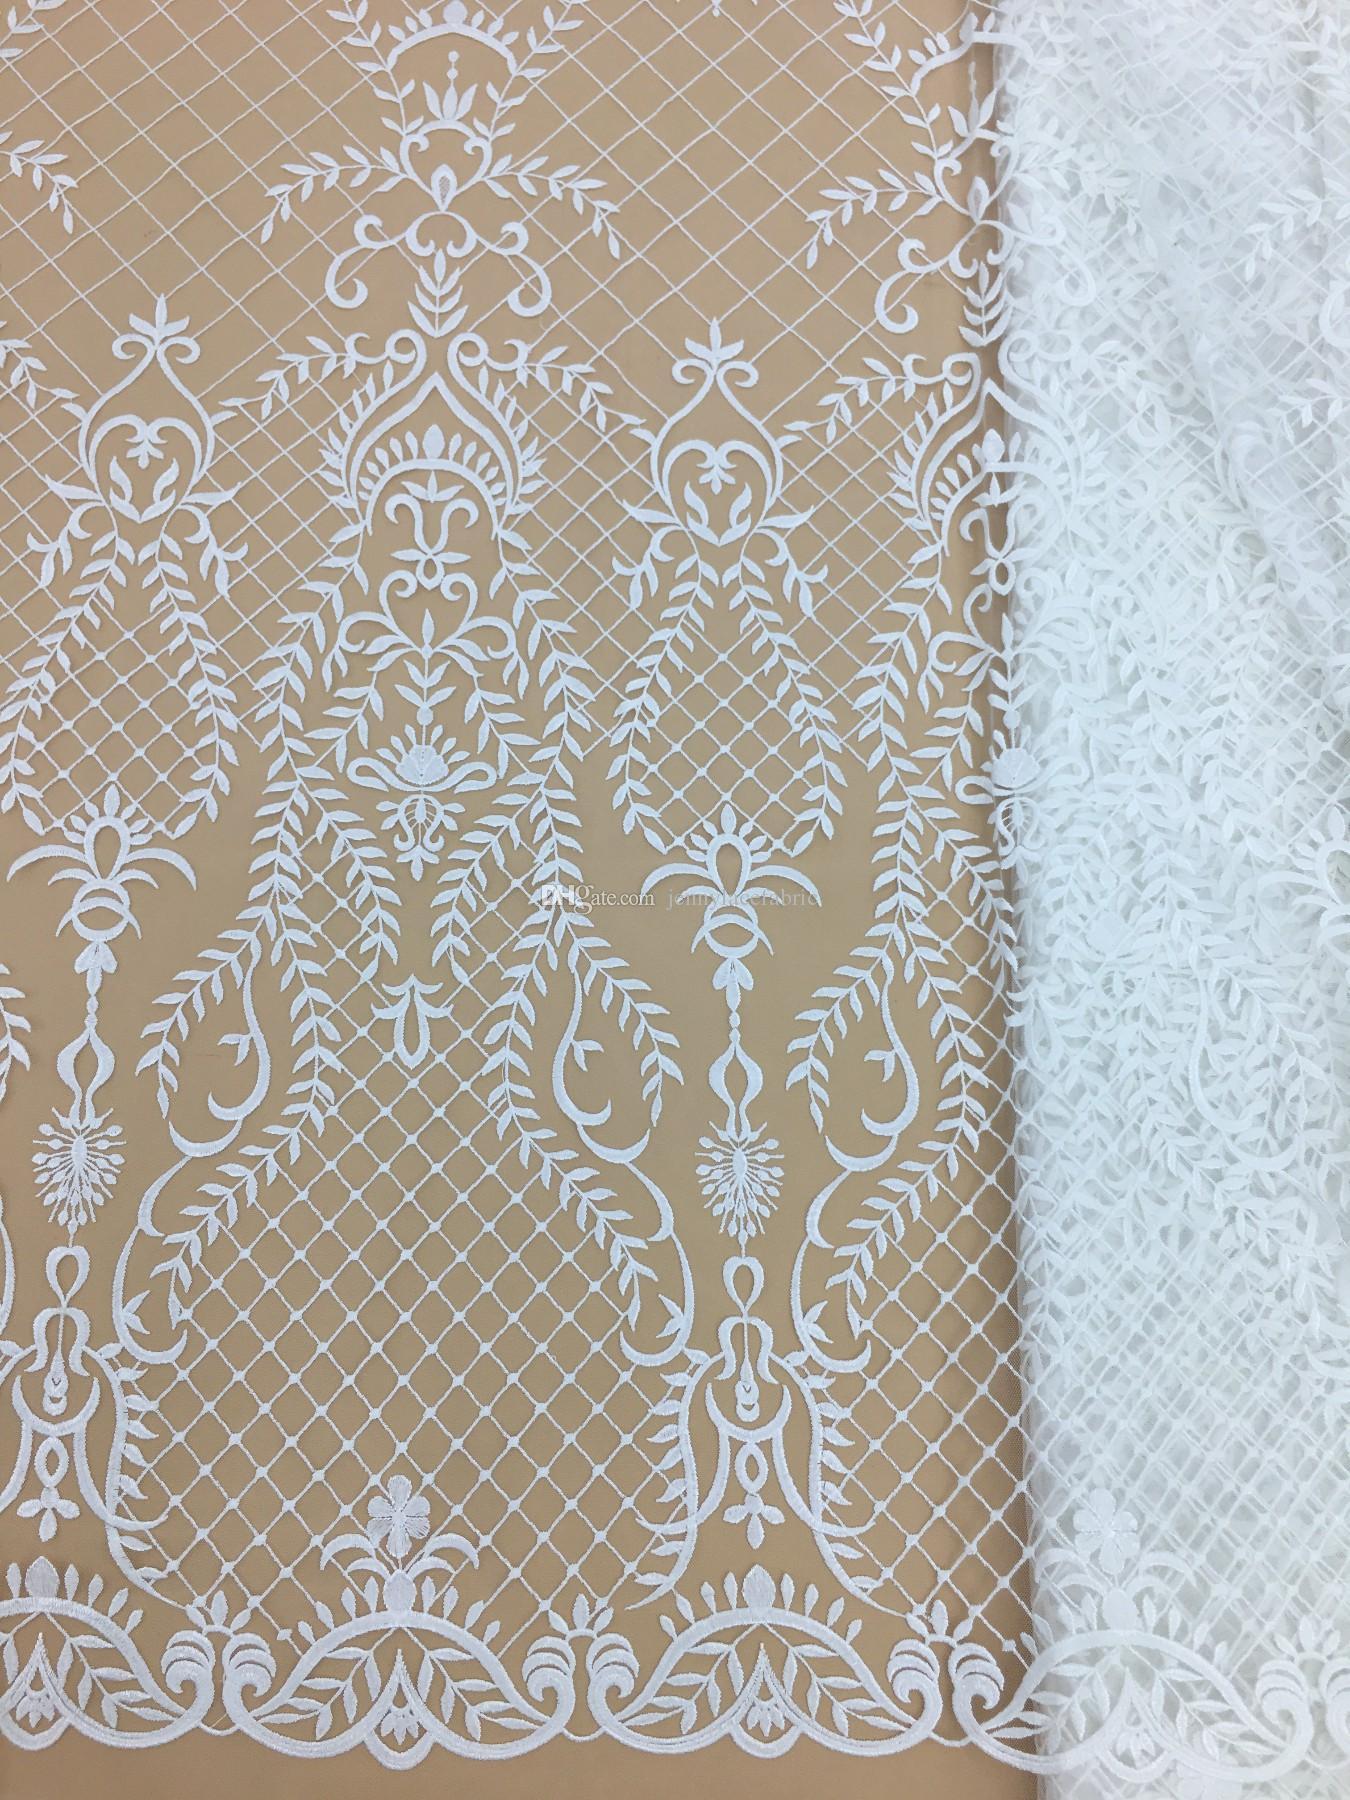 569e31547542f Beautiful Flower Embroidery Lace Fabric